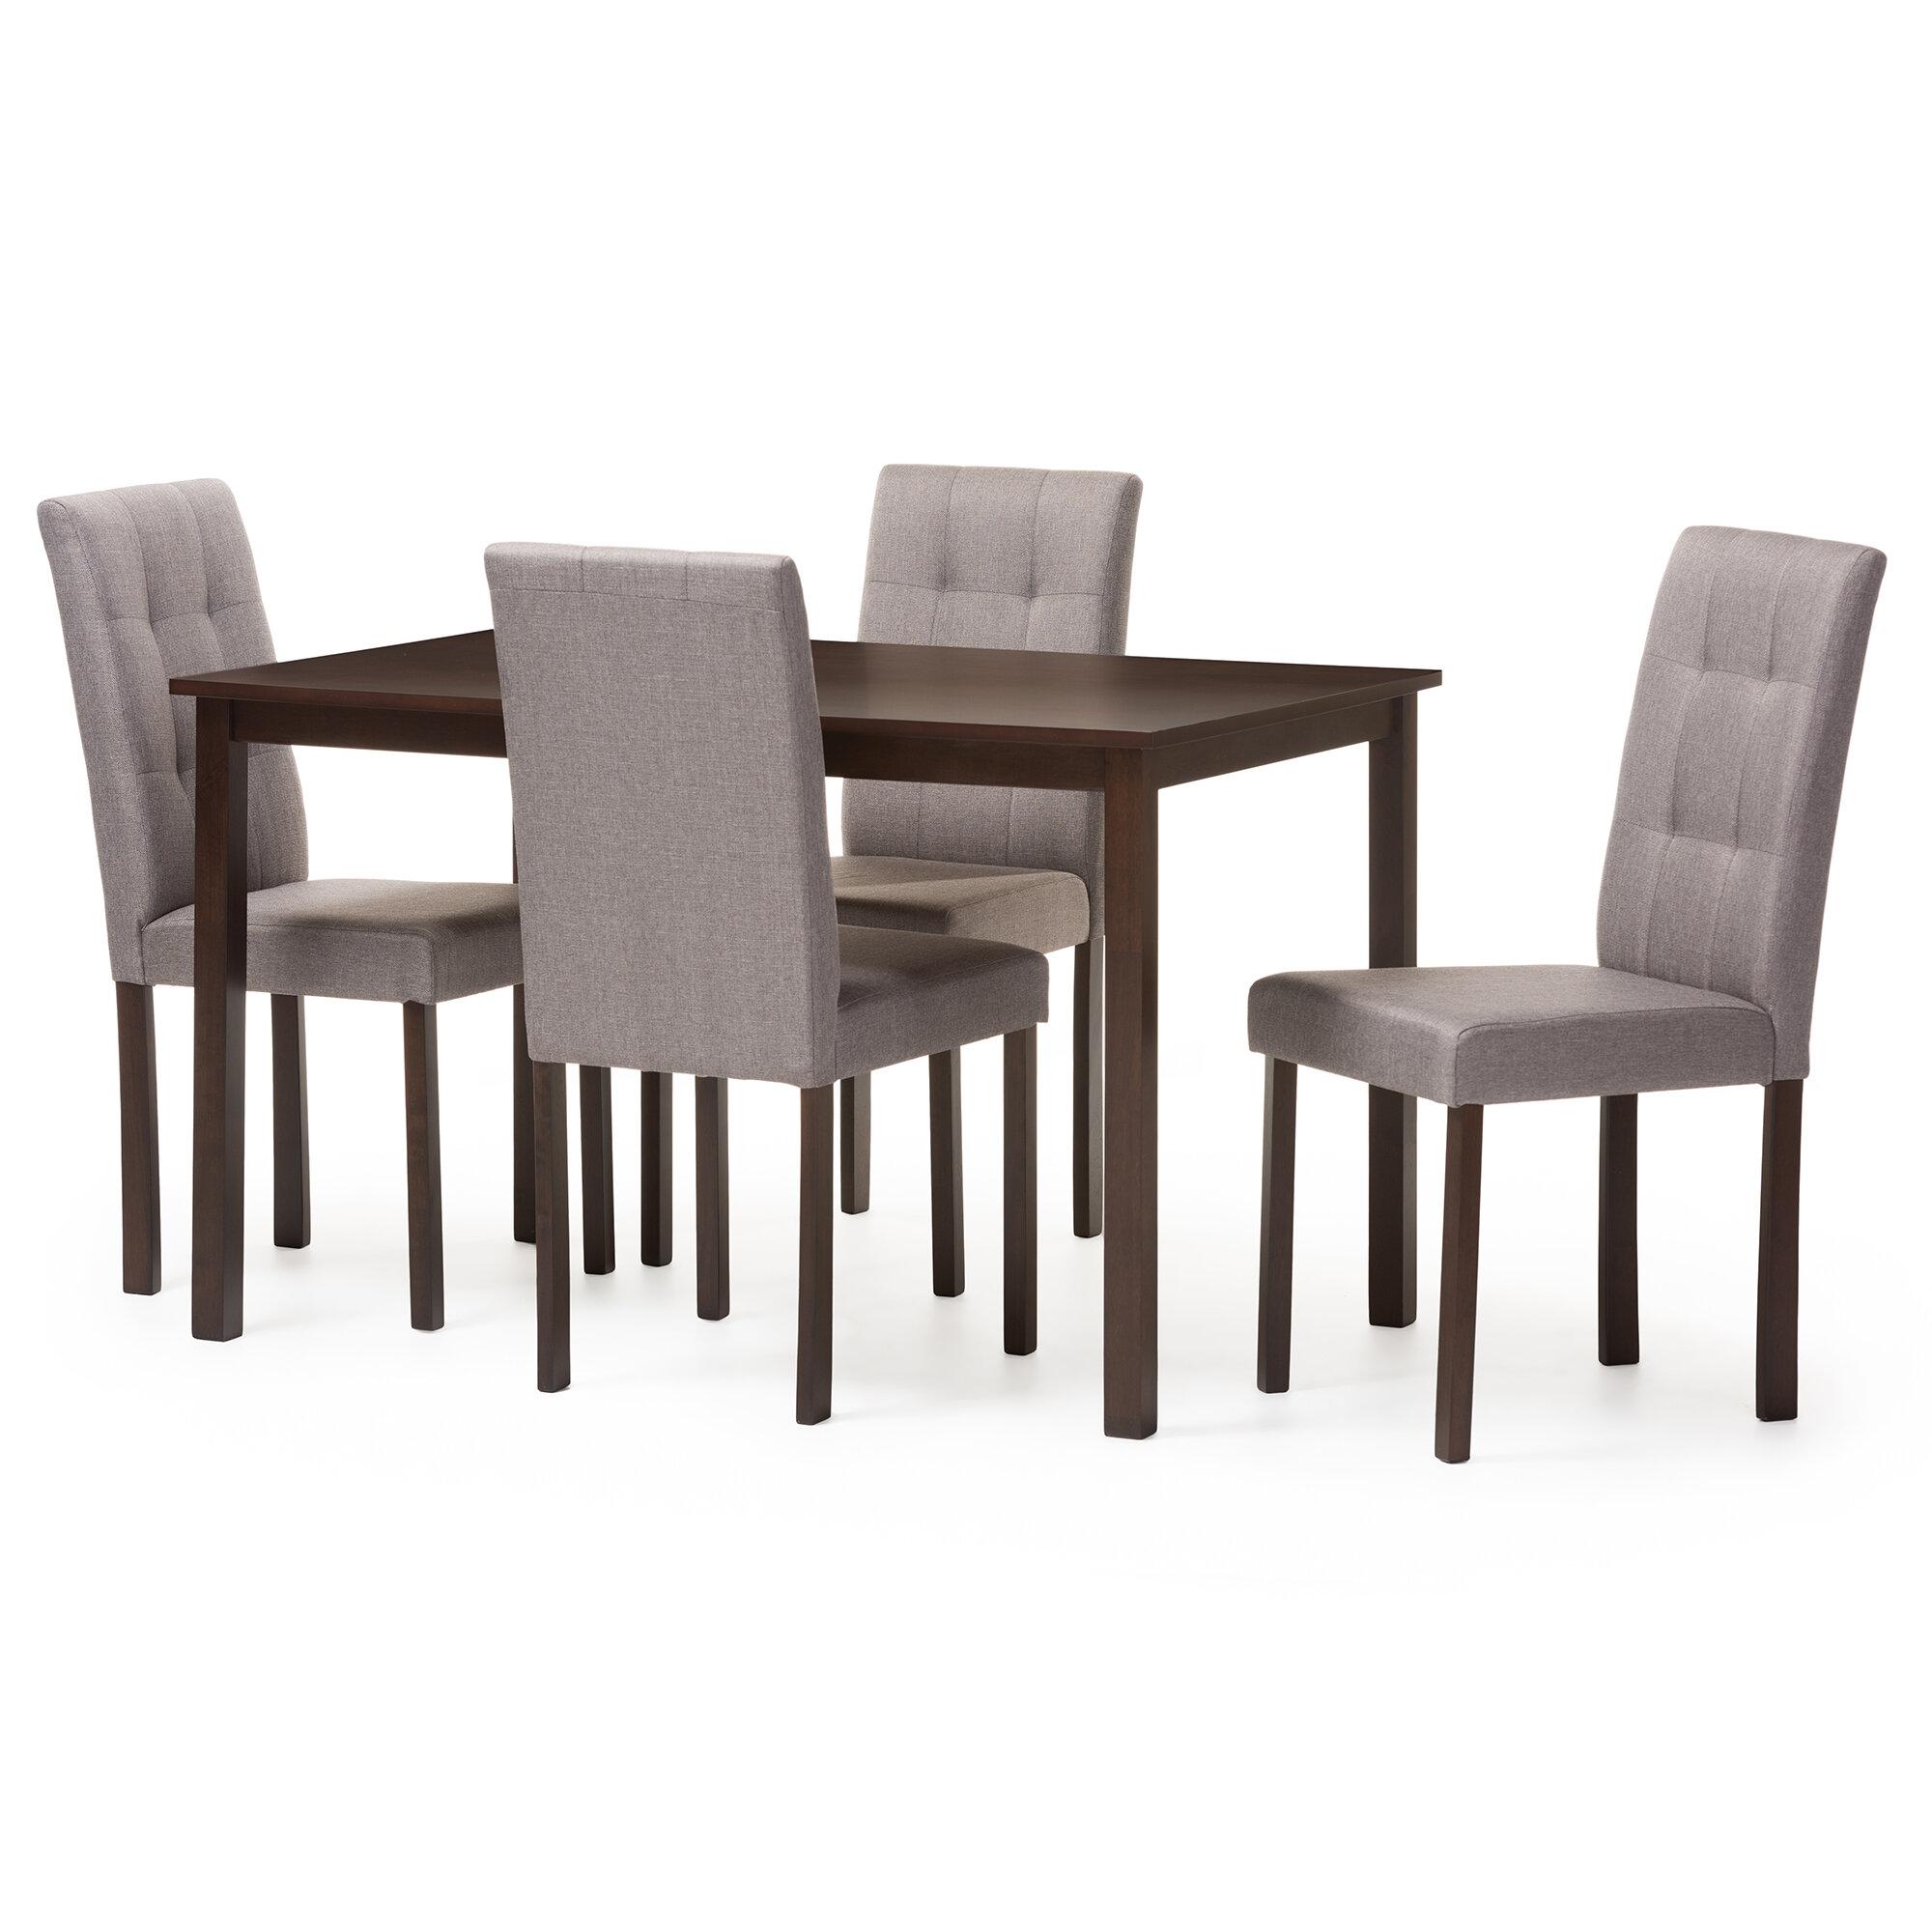 f0906b5f36c6 Wholesale Interiors Andrew 5 Piece Dining Set   Reviews